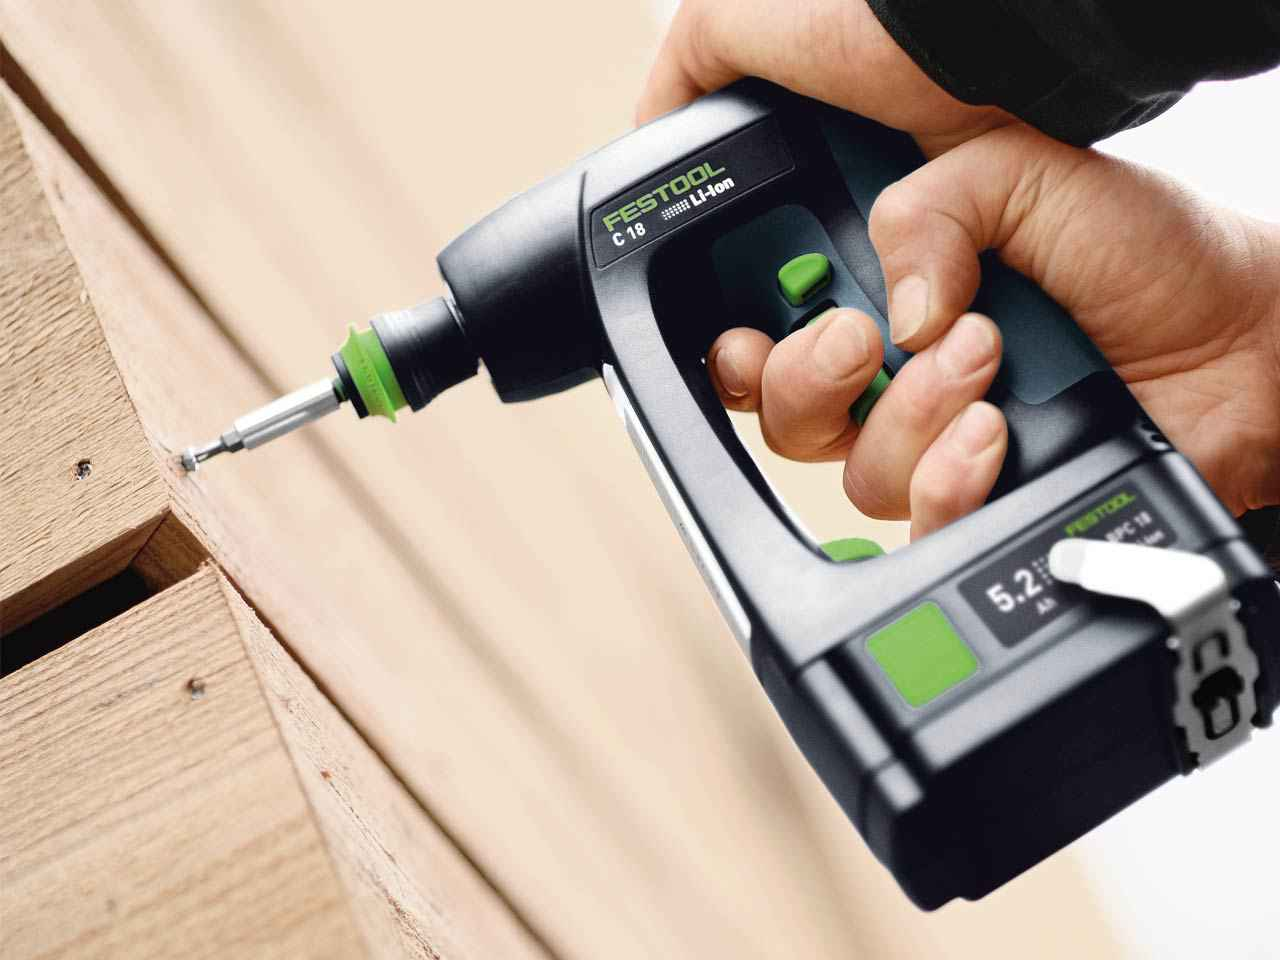 festool c 18 li 5 2 set 18v cordless drill in. Black Bedroom Furniture Sets. Home Design Ideas